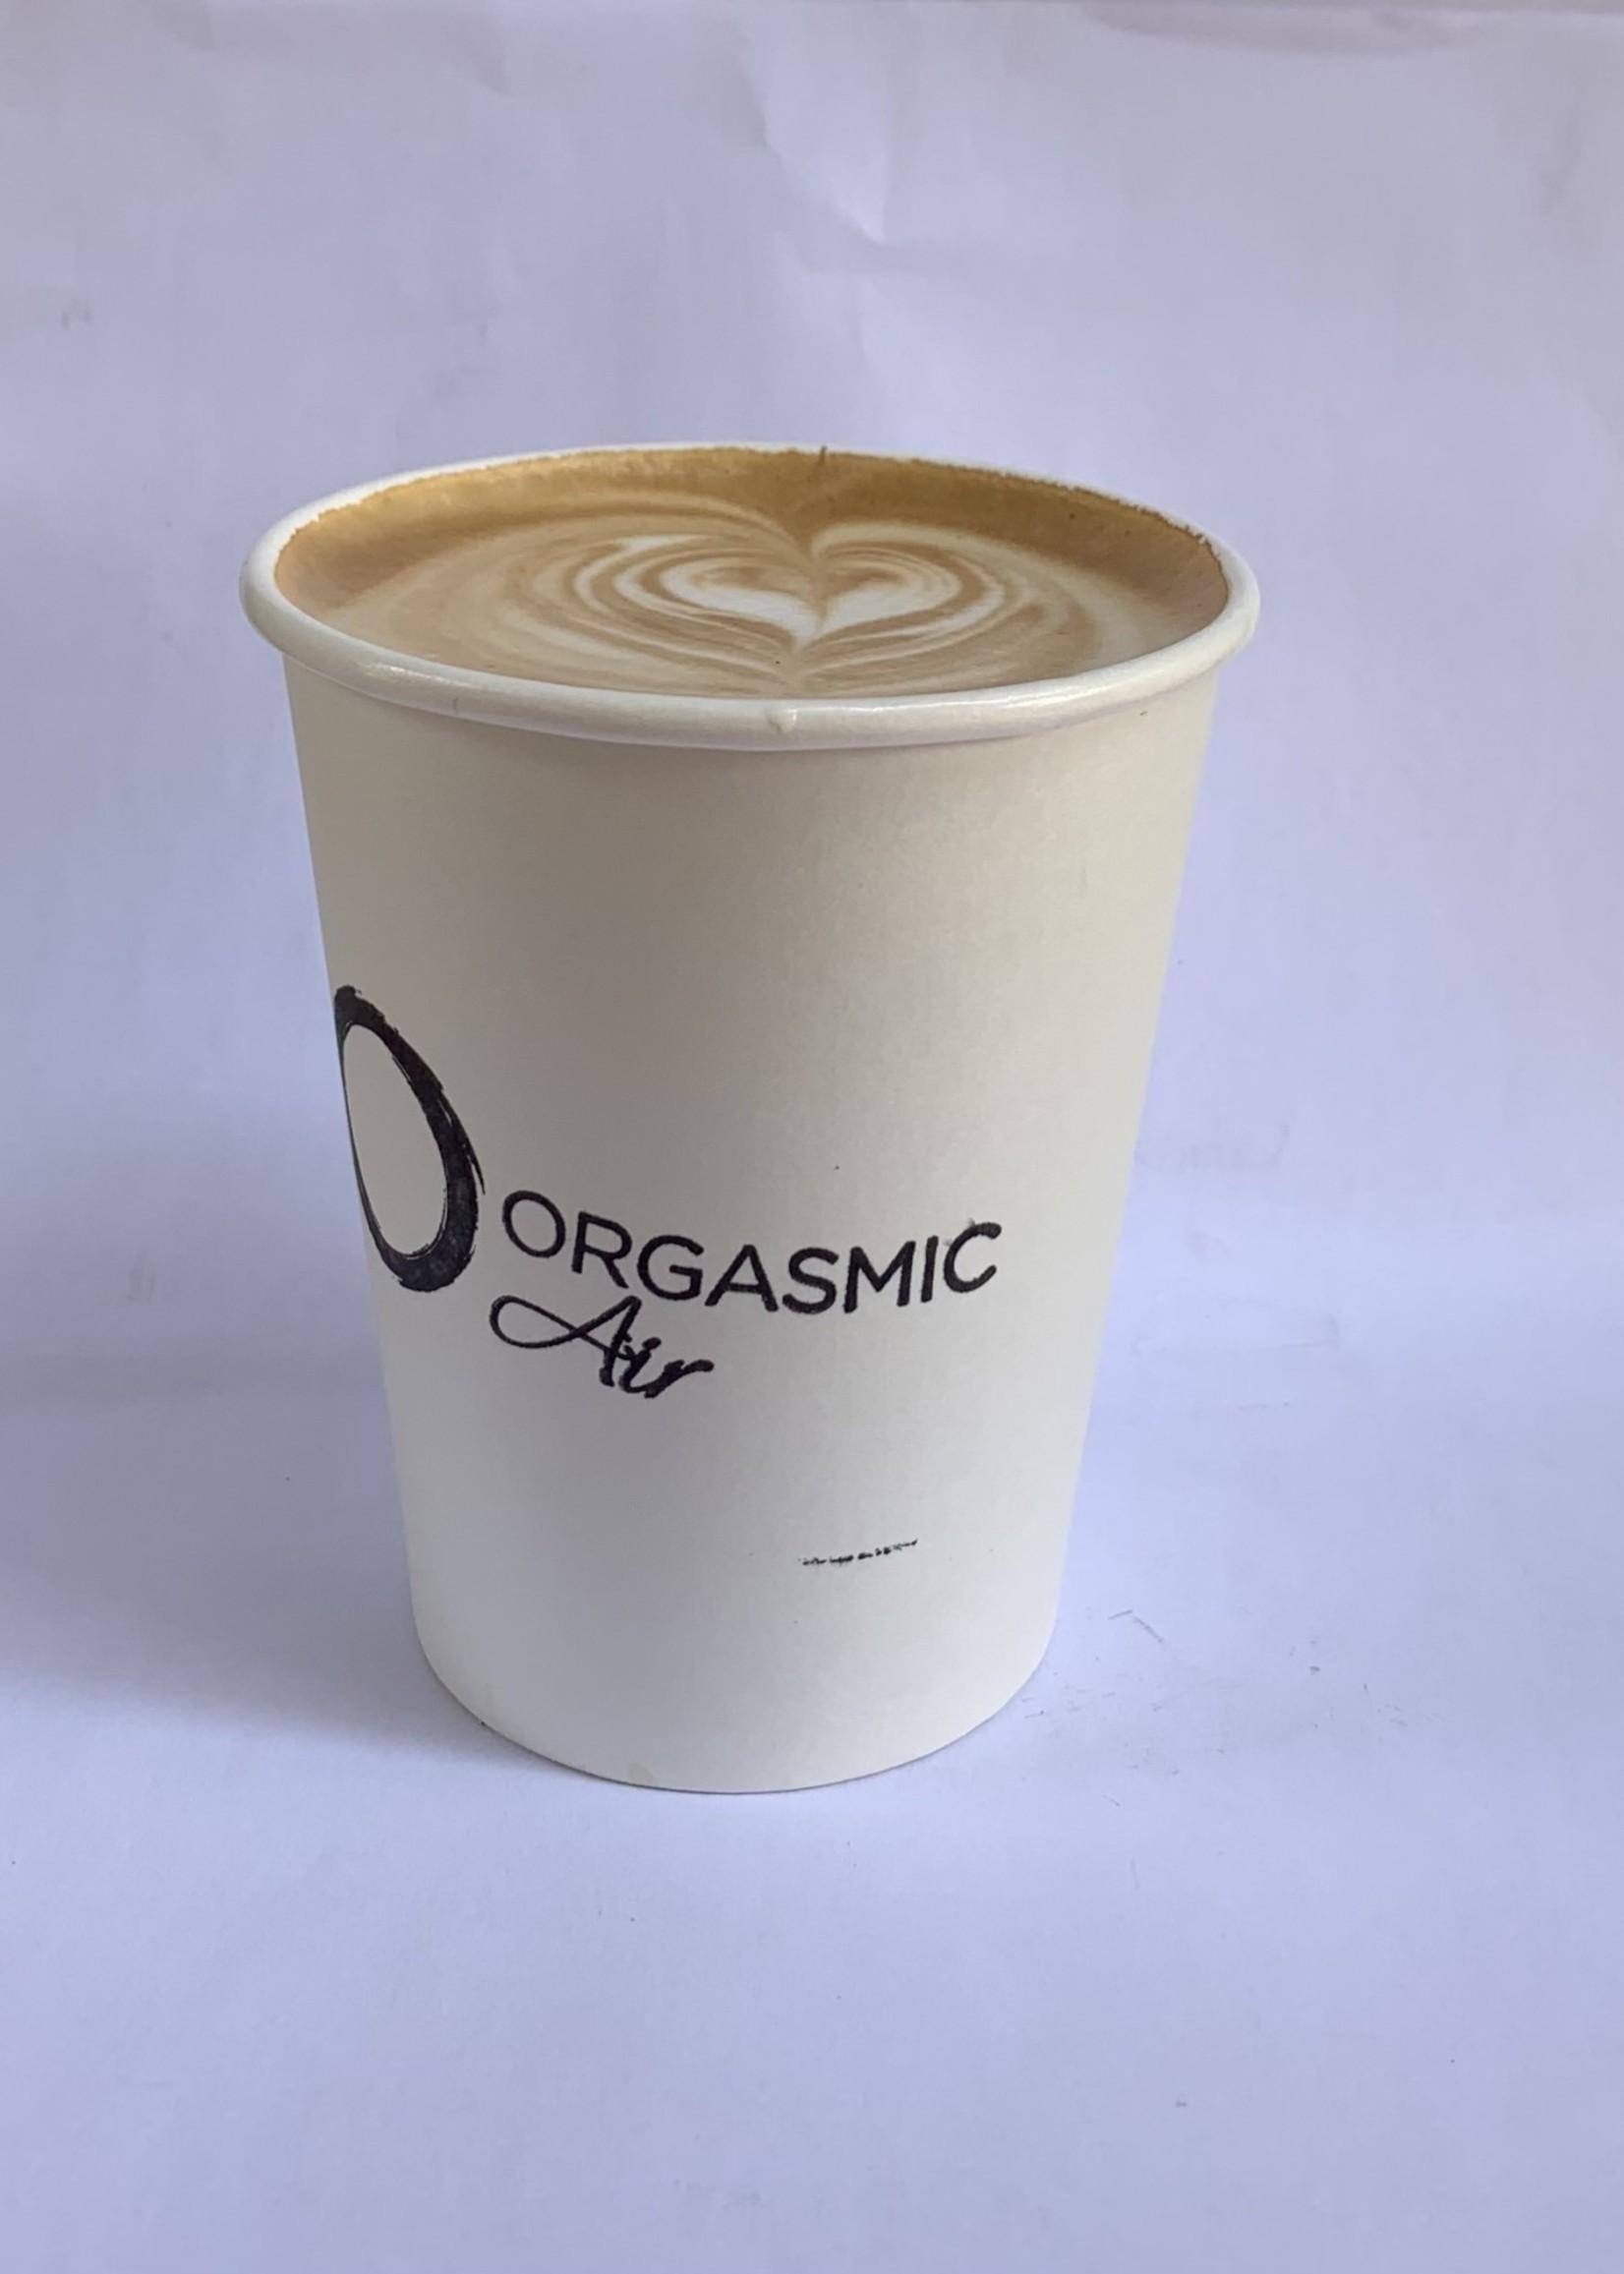 Organic & Air CBD infused cappuccino